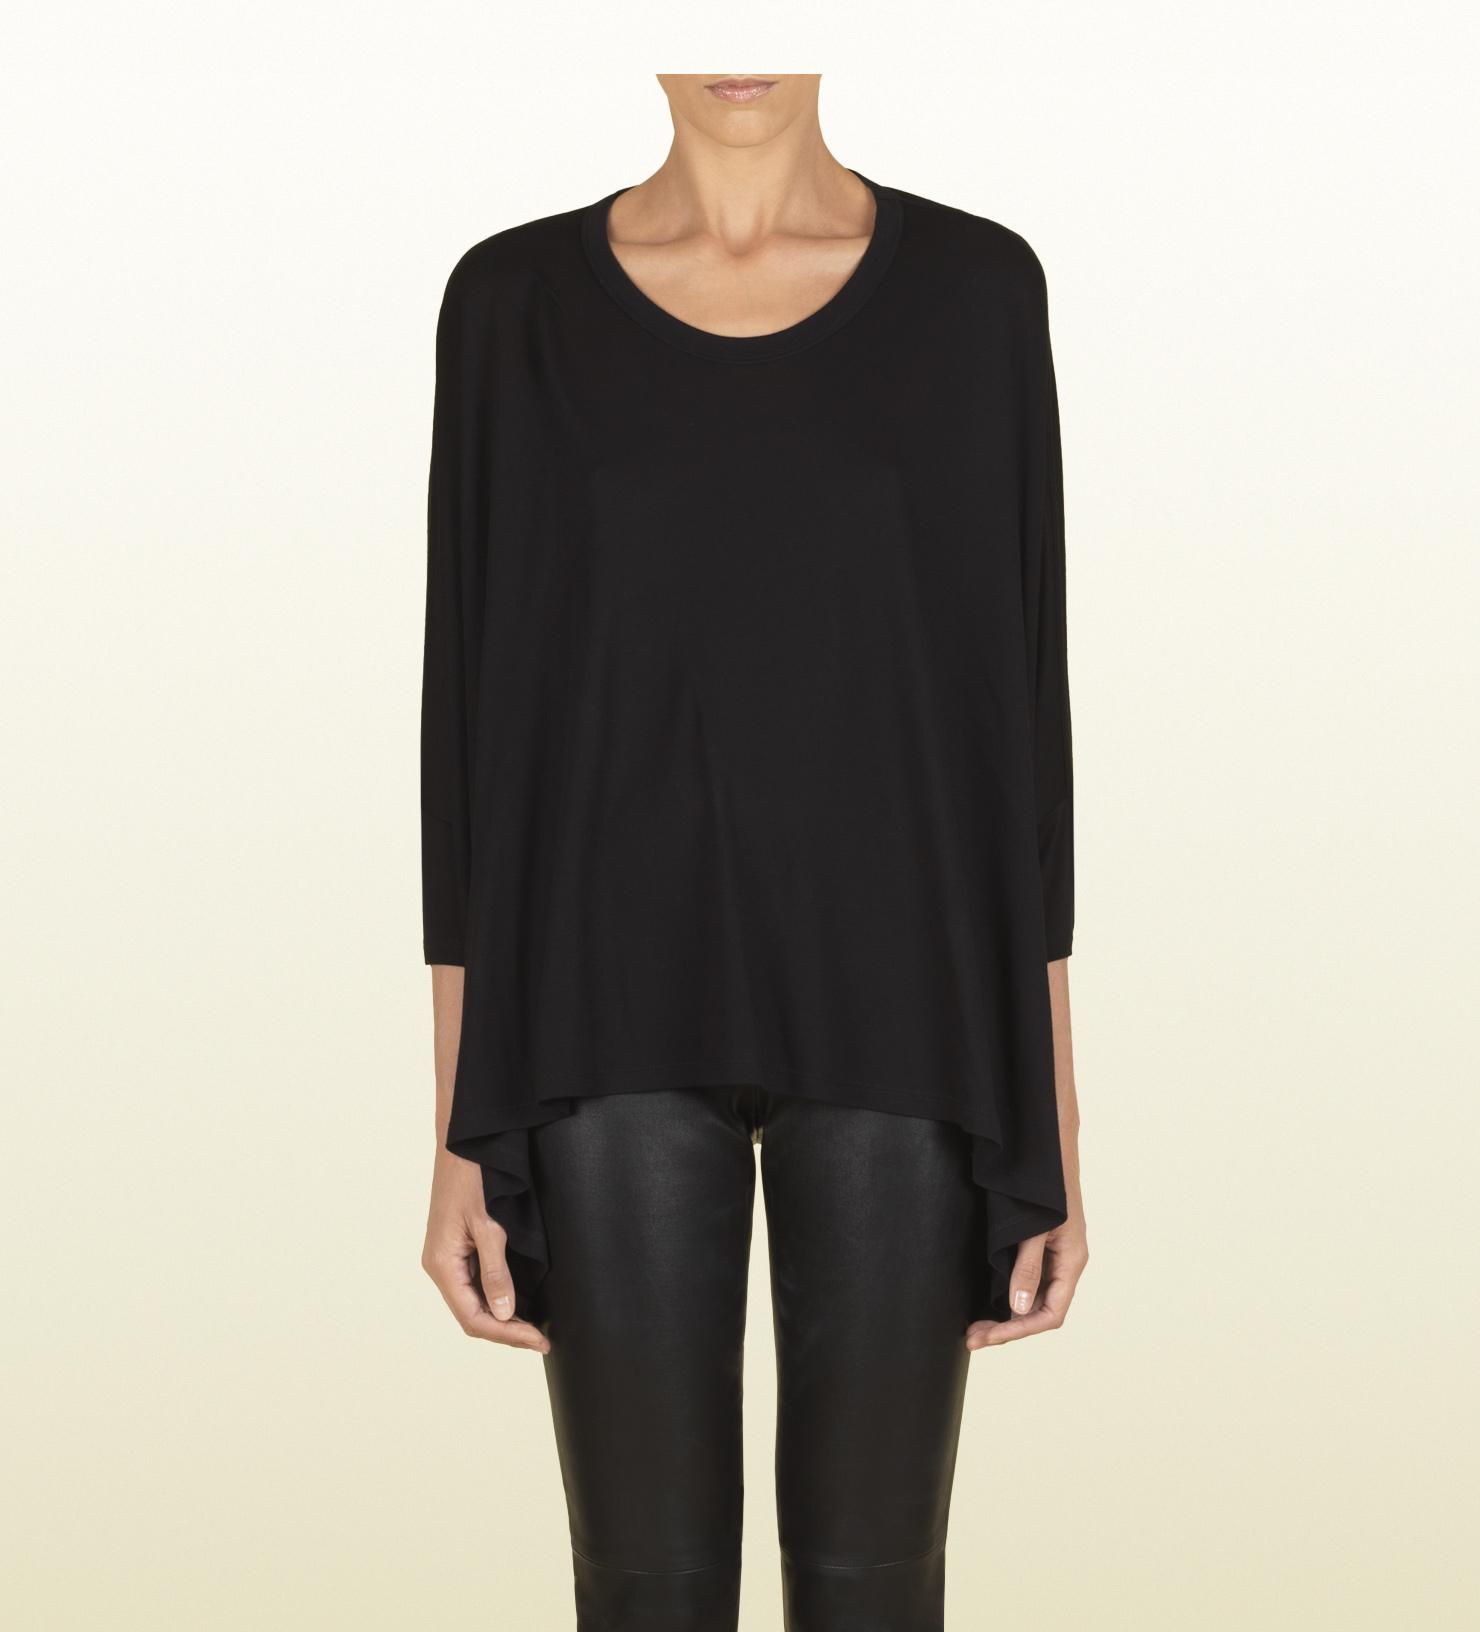 51708ff09497c Womens Gucci T Shirt Black